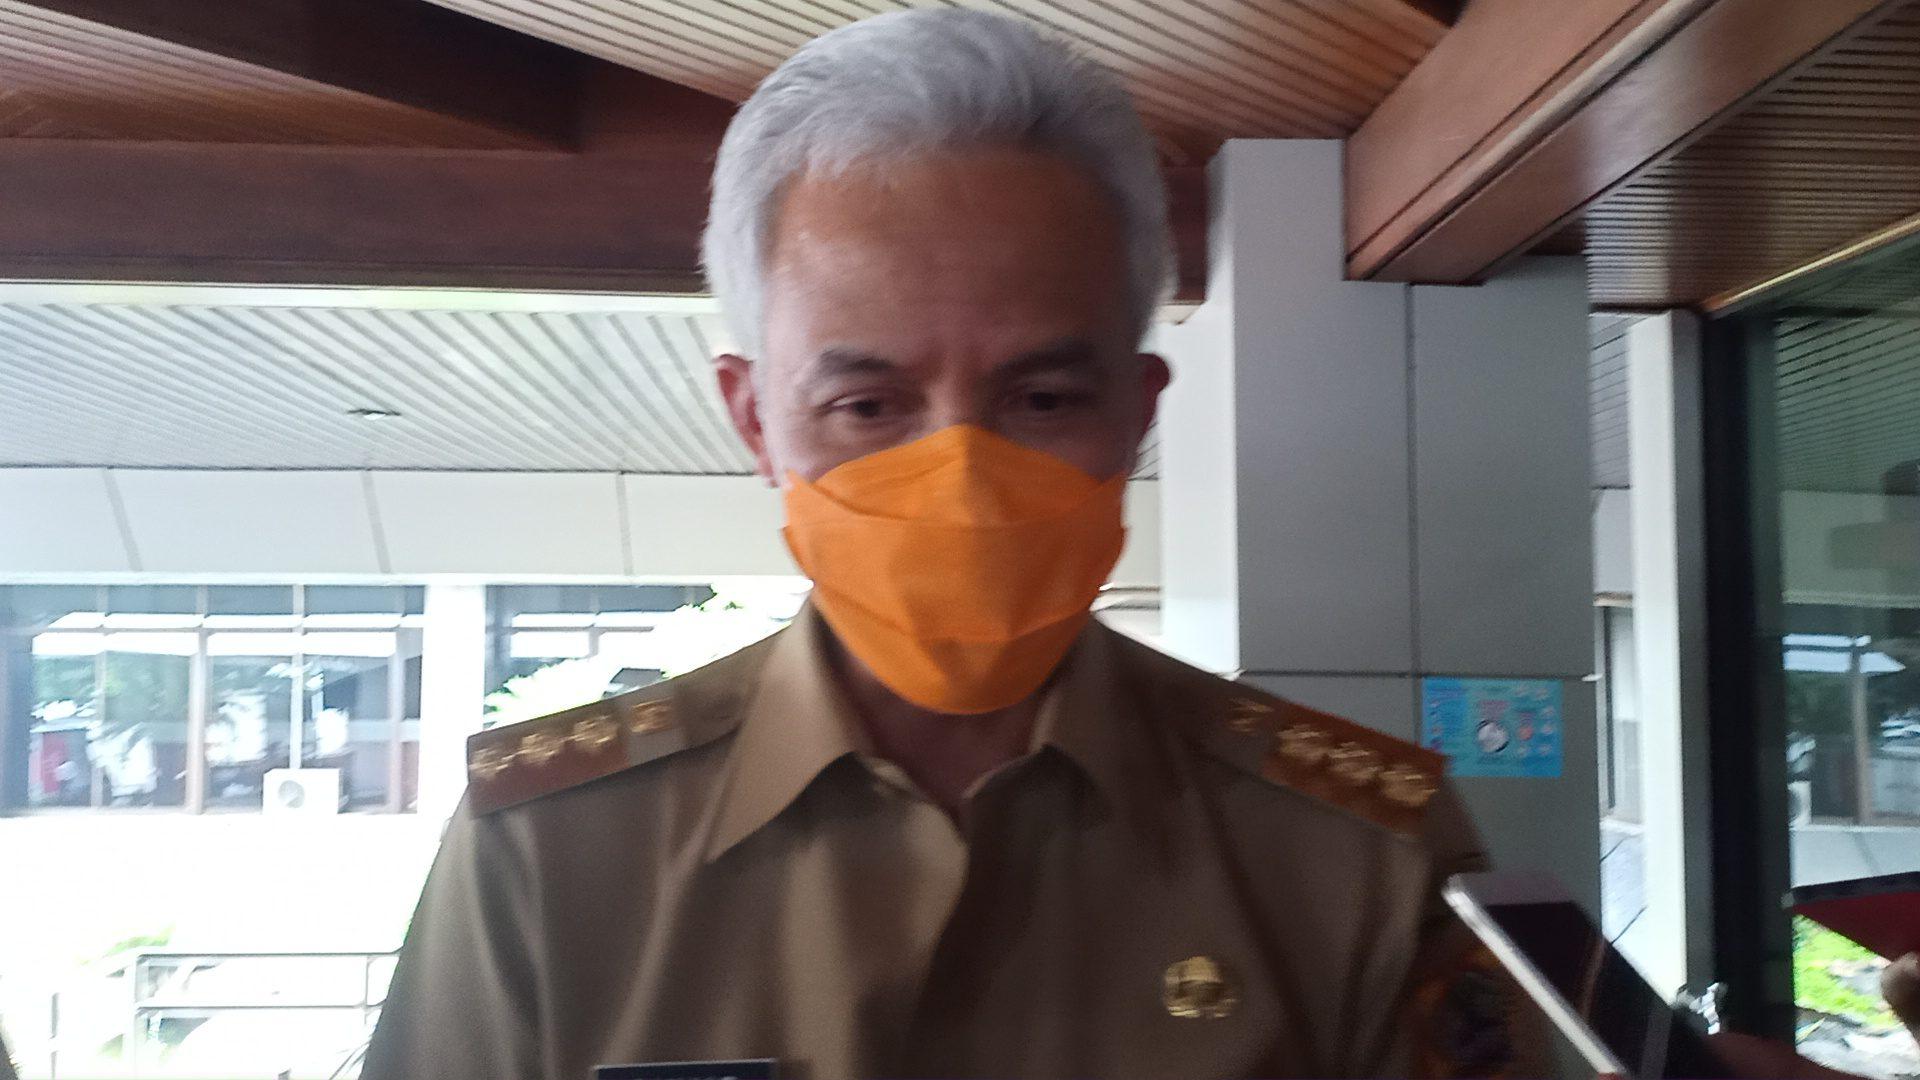 Gubernur Jateng Usai Rapat Penanganan Covid-19, Rezanda Akbar D/Lingkar.co